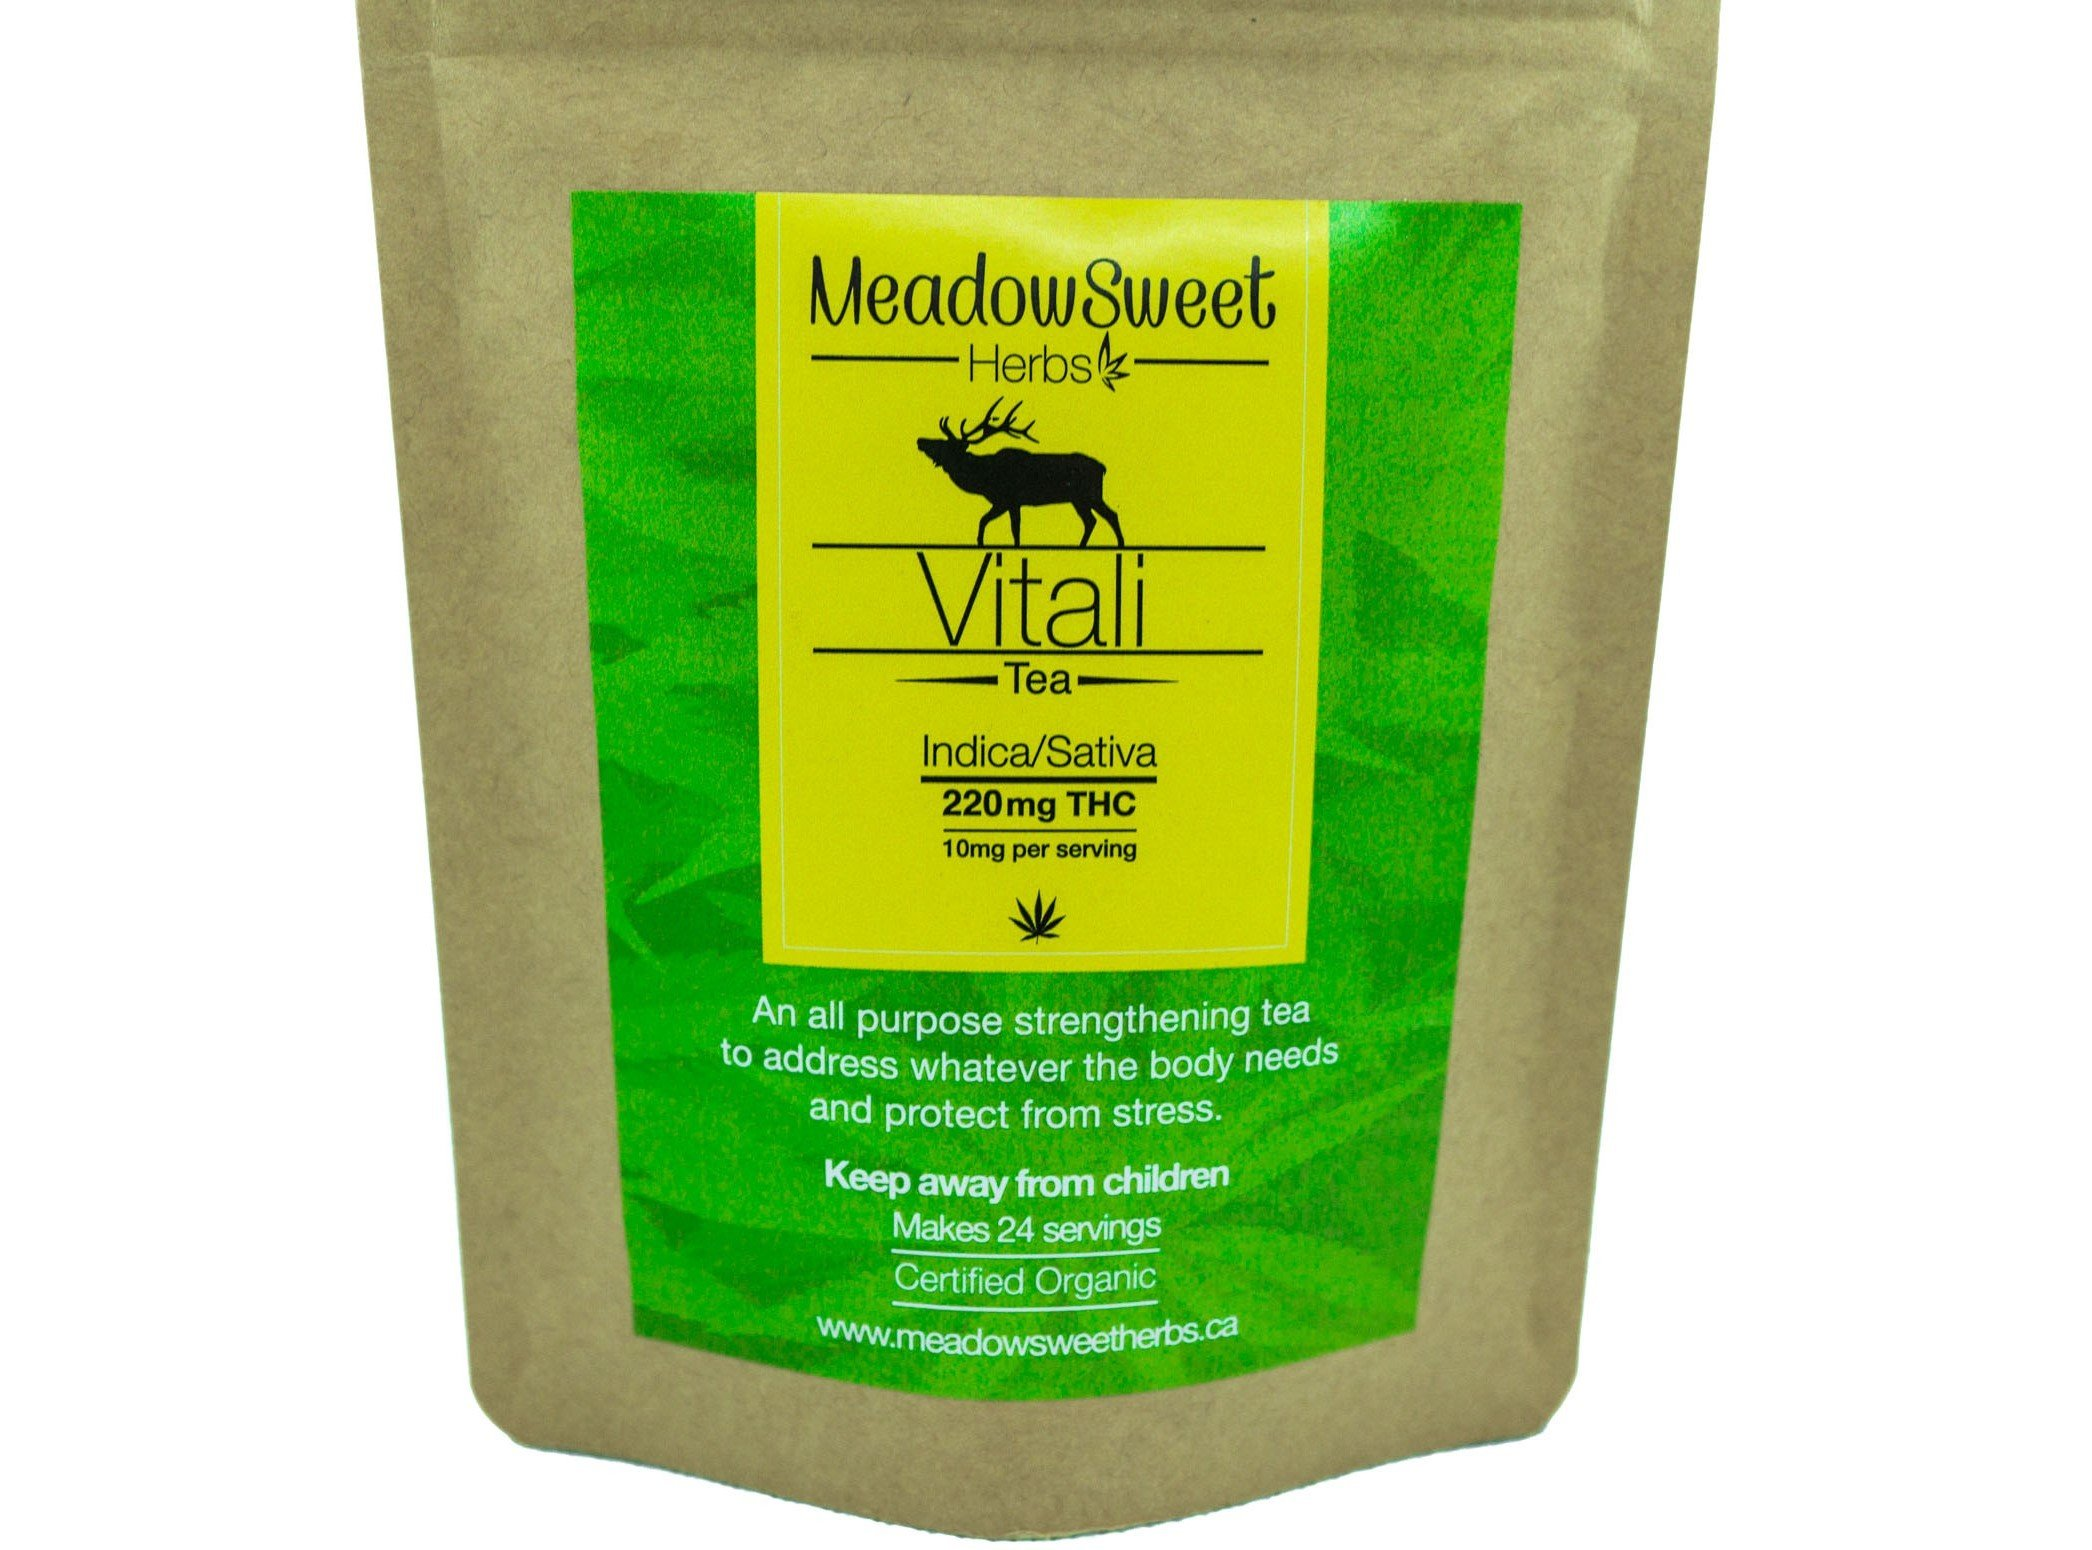 Vitali Tea by MeadowSweet Herbs (220mg THC) 01150